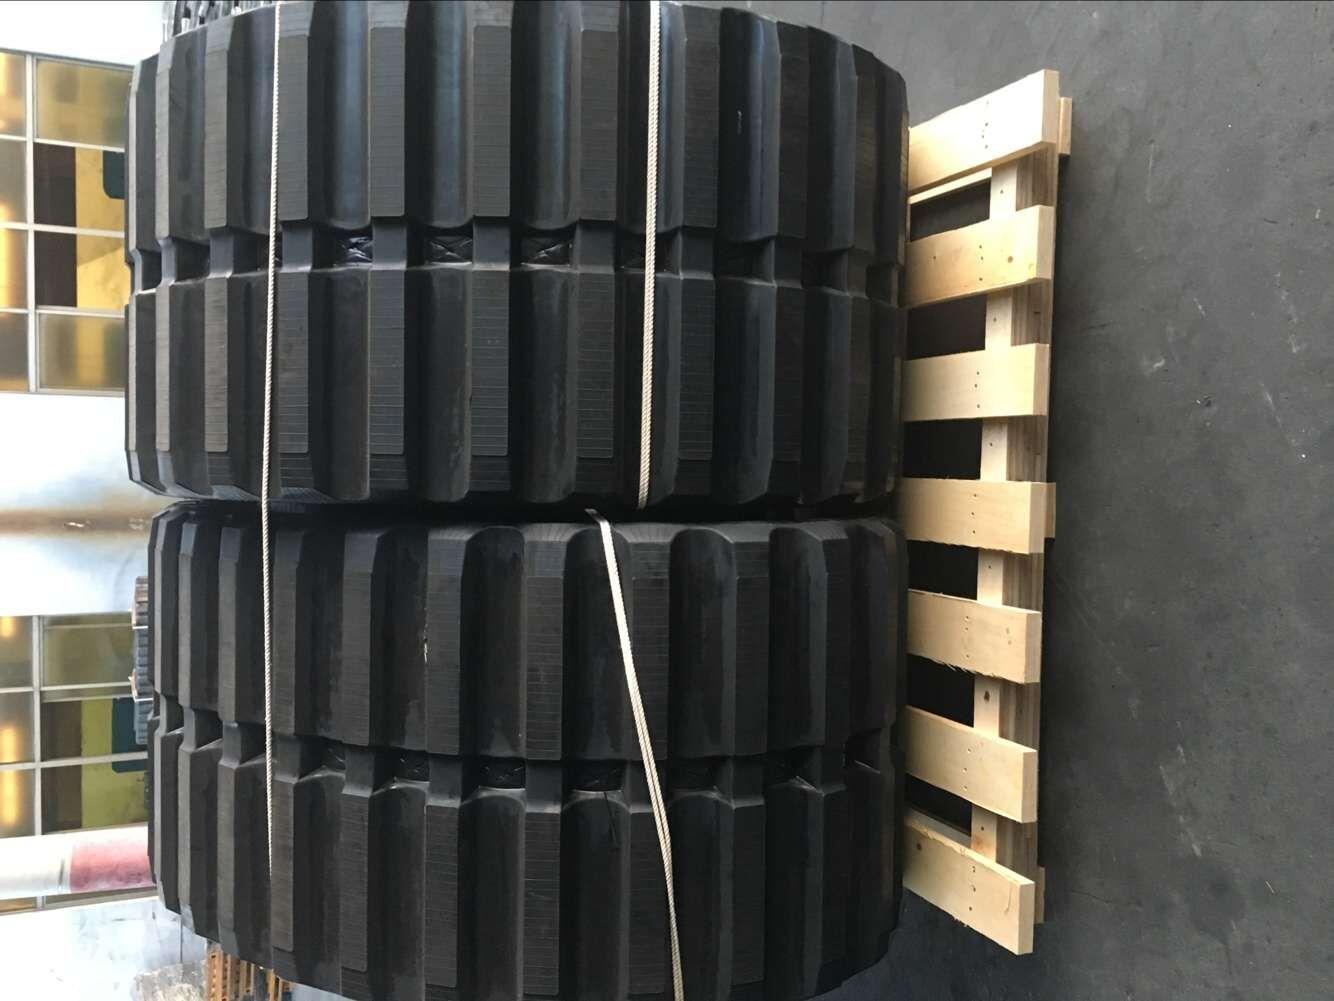 Hitachi Cg100/110 and Mst3000vd Dumper Rubber Track (80015066)